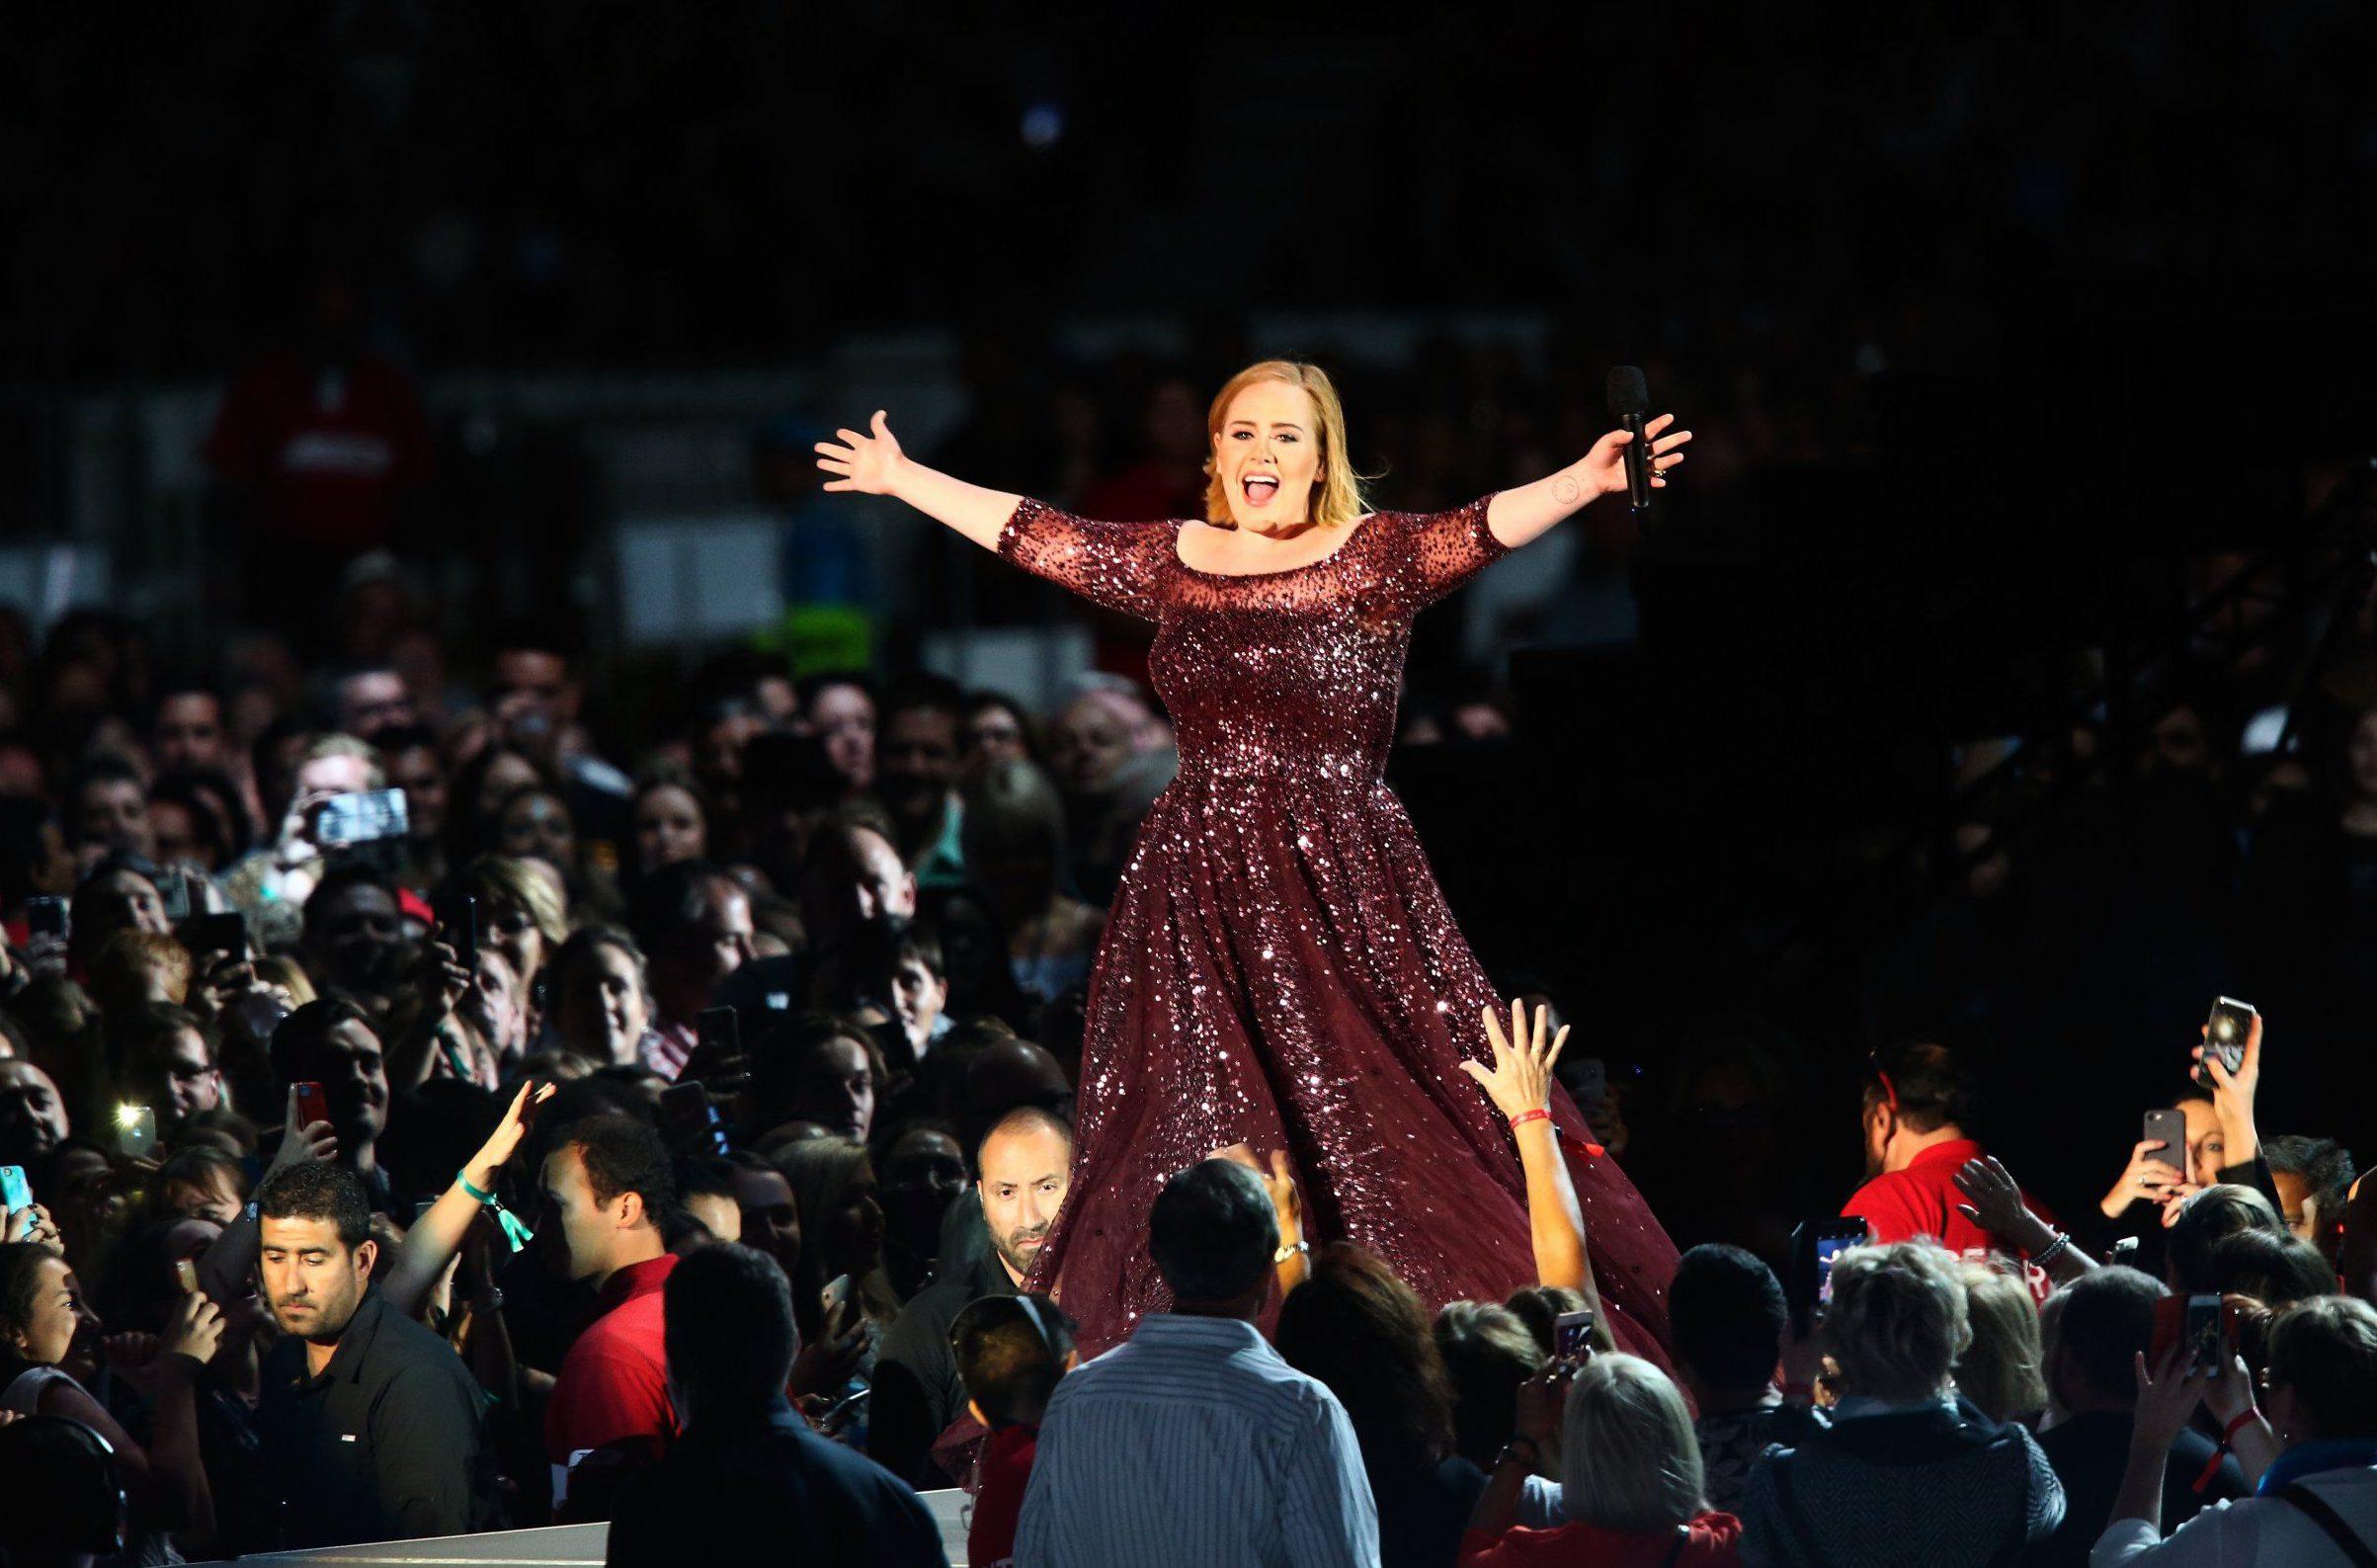 ADELAIDE, AUSTRALIA - MARCH 13: Adele performs at Adelaide Oval on March 13, 2017 in Adelaide, Australia. (Photo by Morne de Klerk/Getty Images)